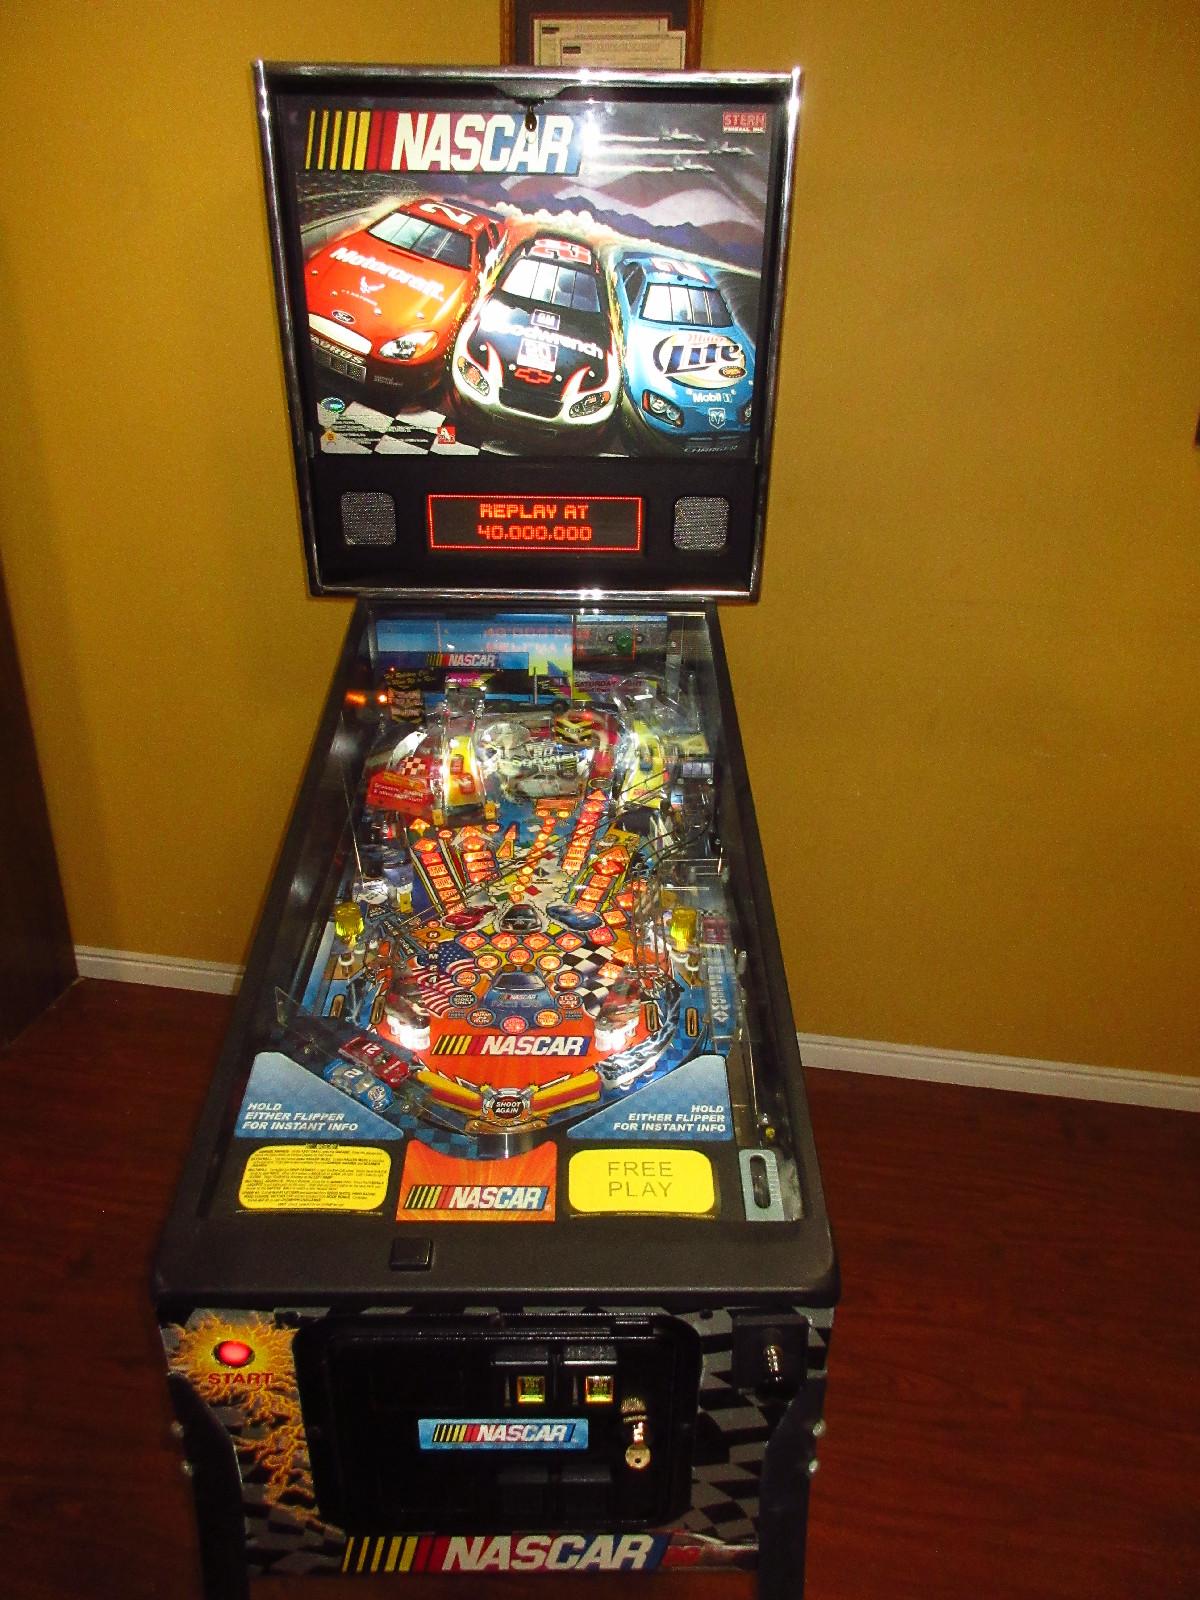 Stern Pinball 🏁 🏎️ 🏁 NASCAR 🏁 🏎️ 🏁 Pinball Machine